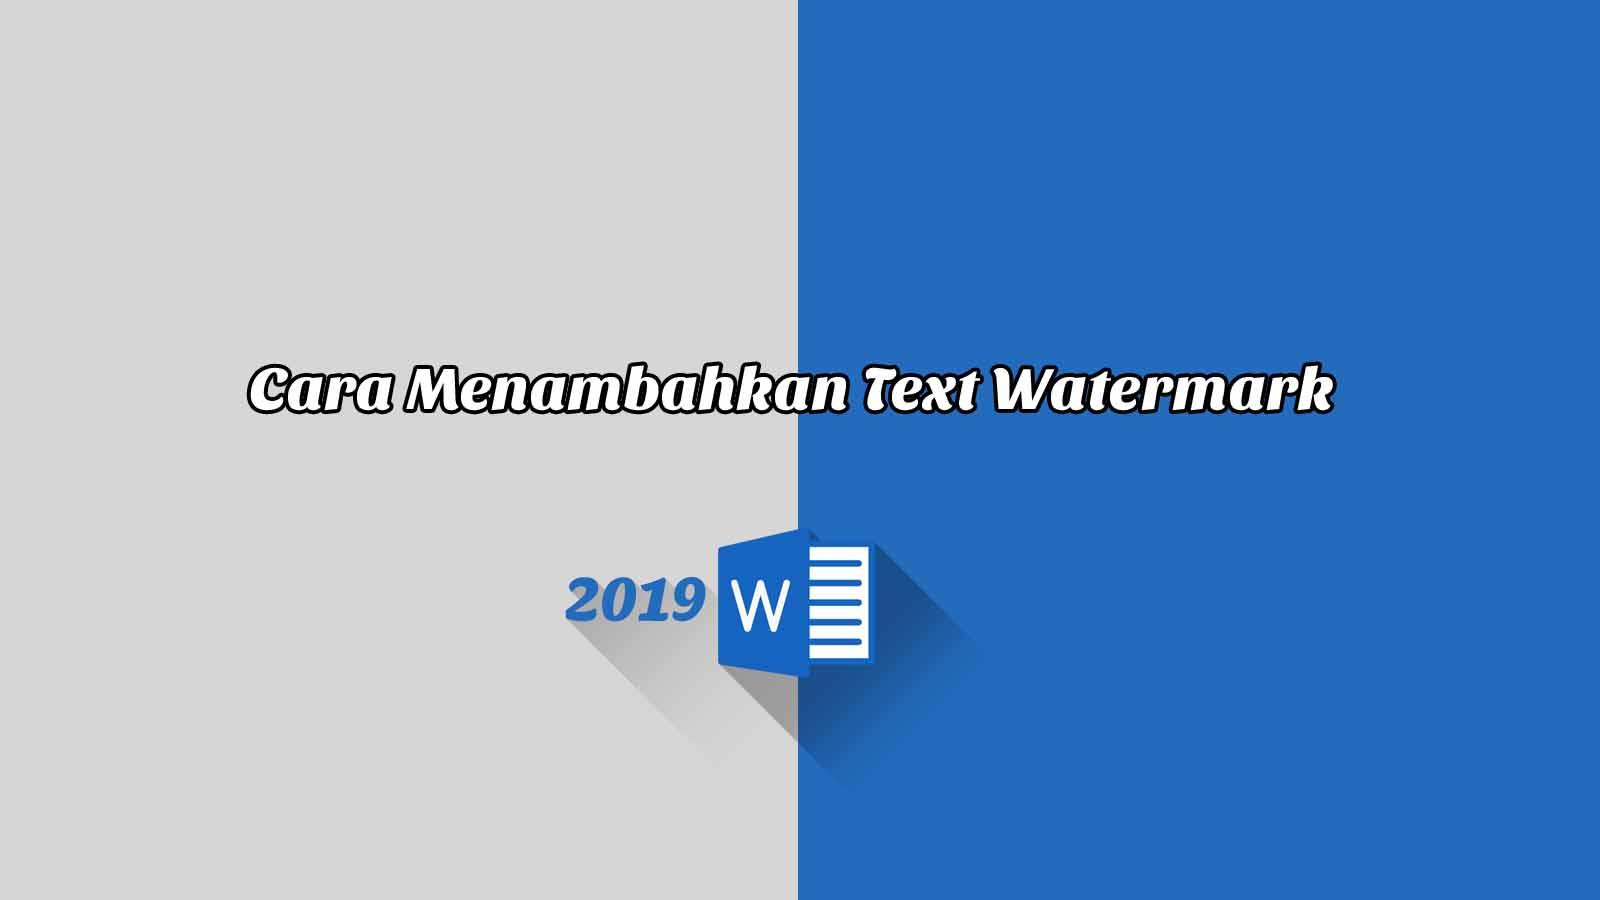 Cara Menambahkan Text Watermark - Word 2019